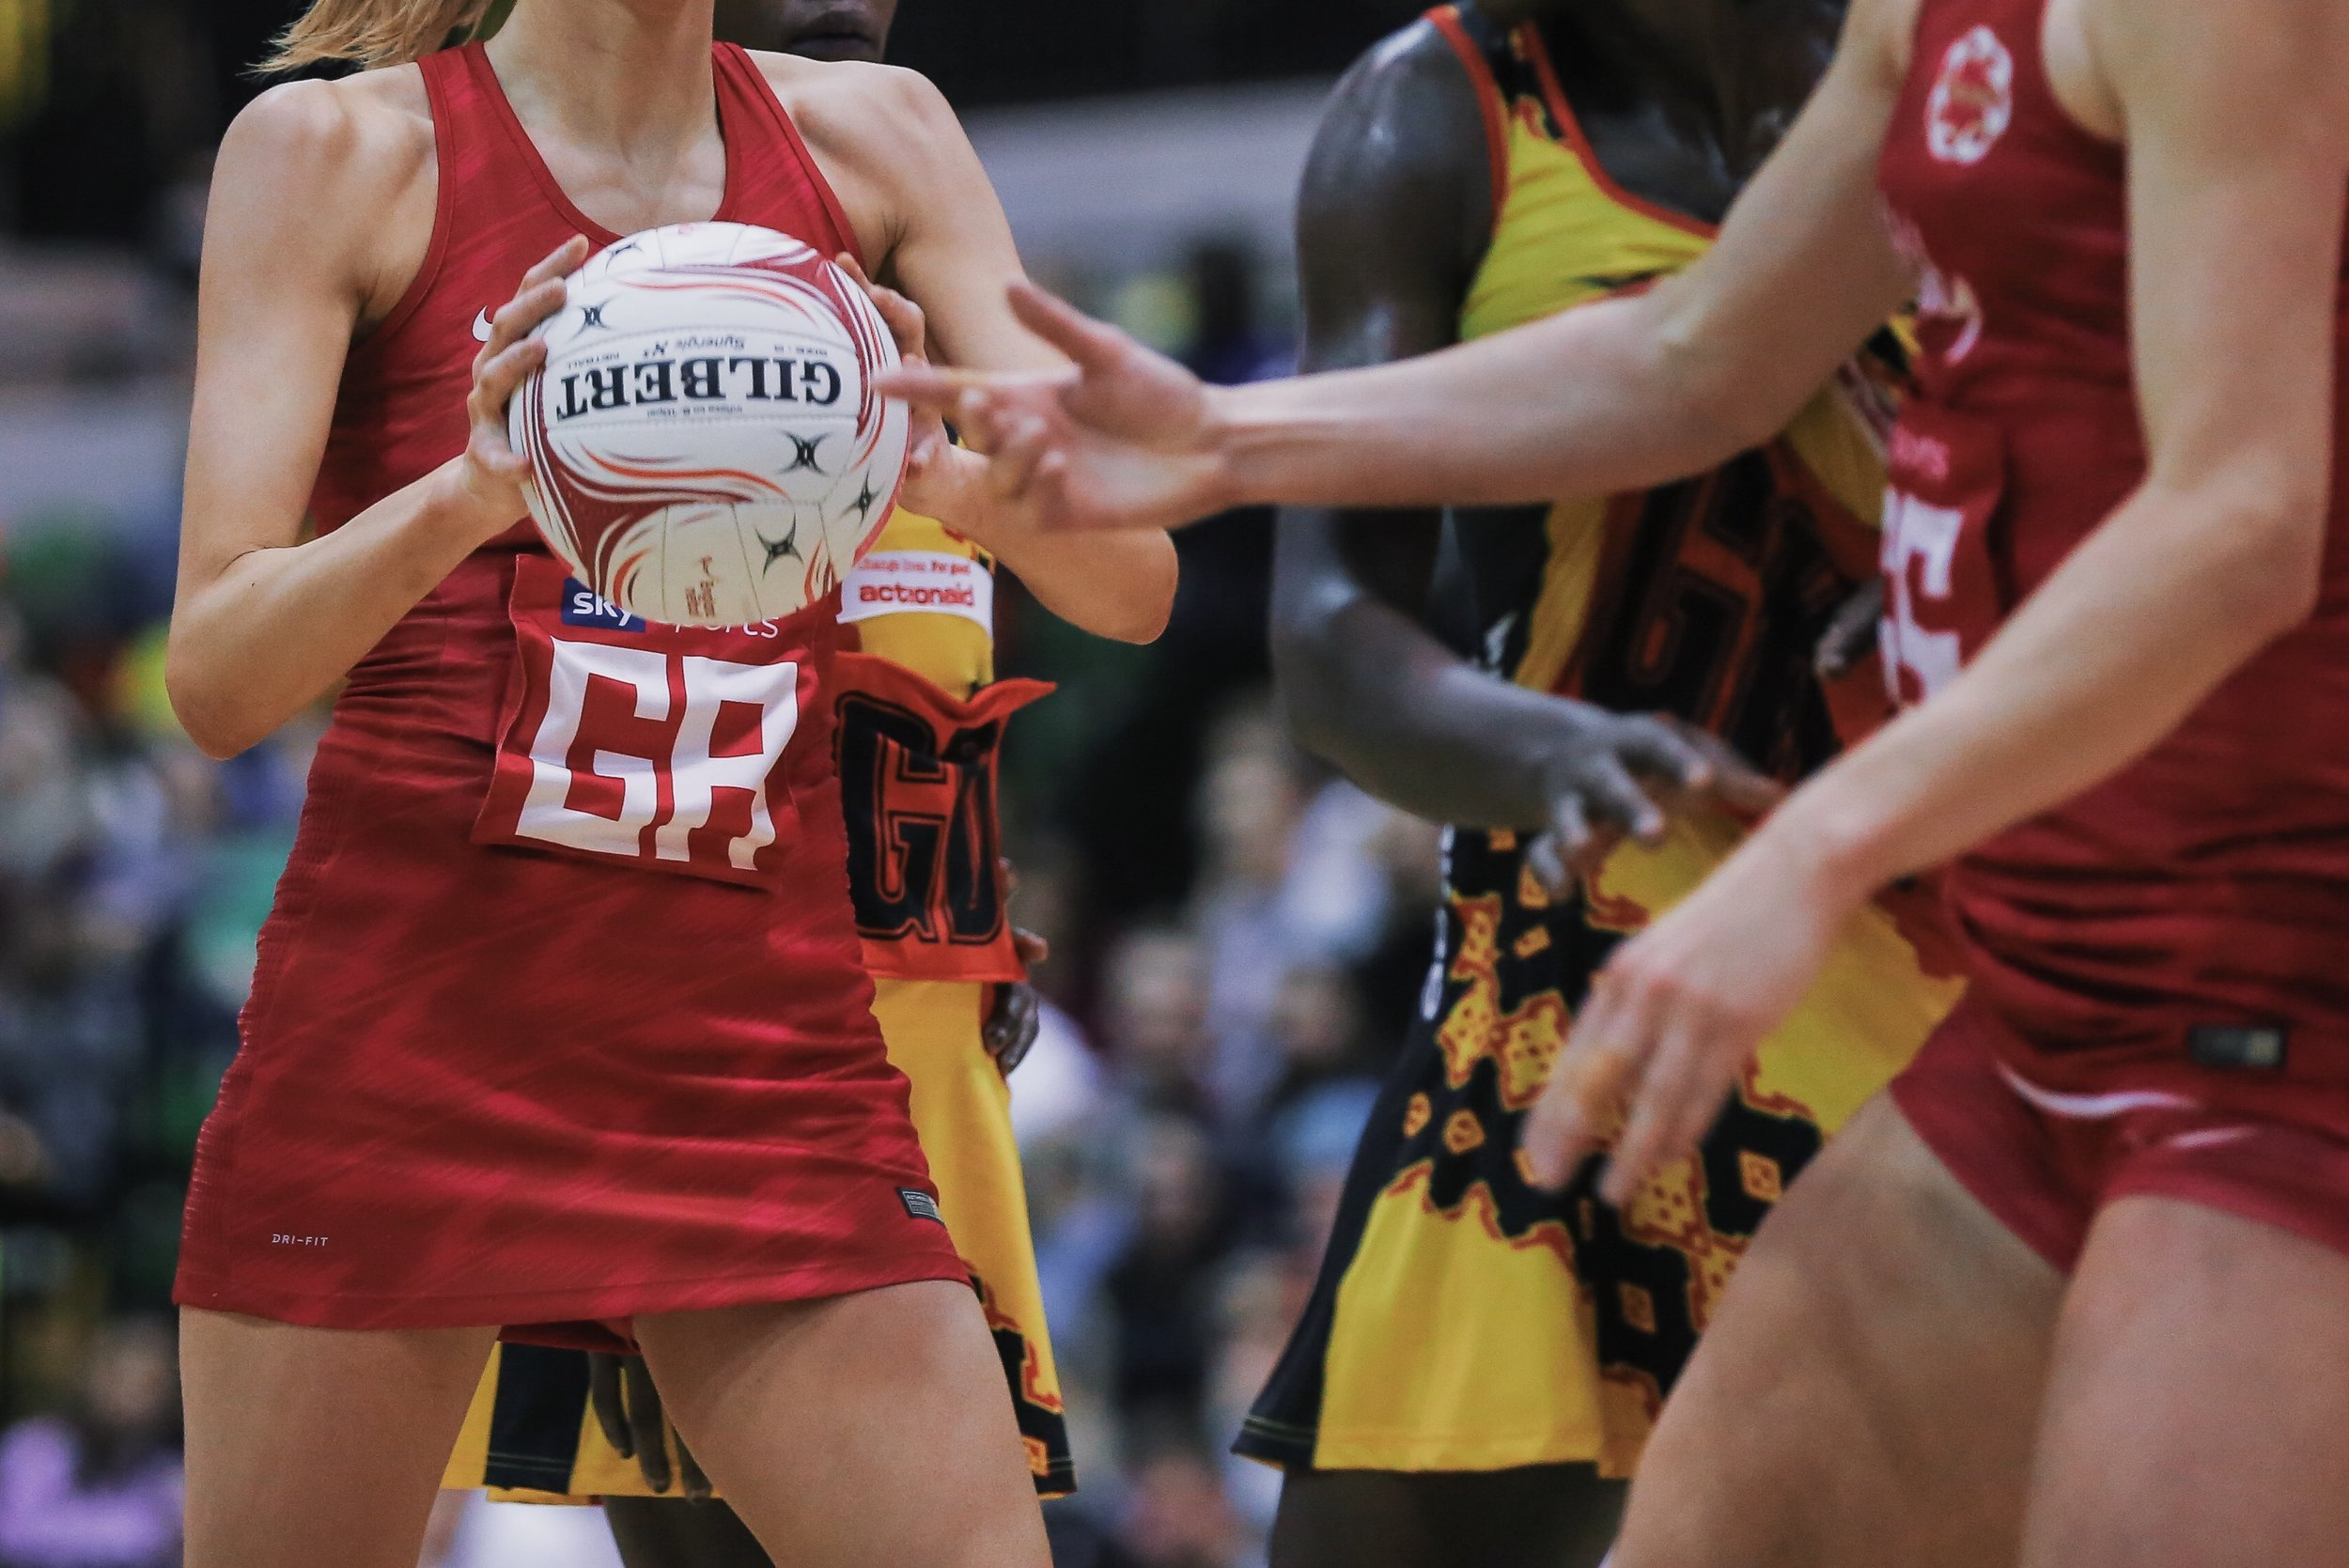 womens-netball-sport-england-uganda-international-series-20.jpg